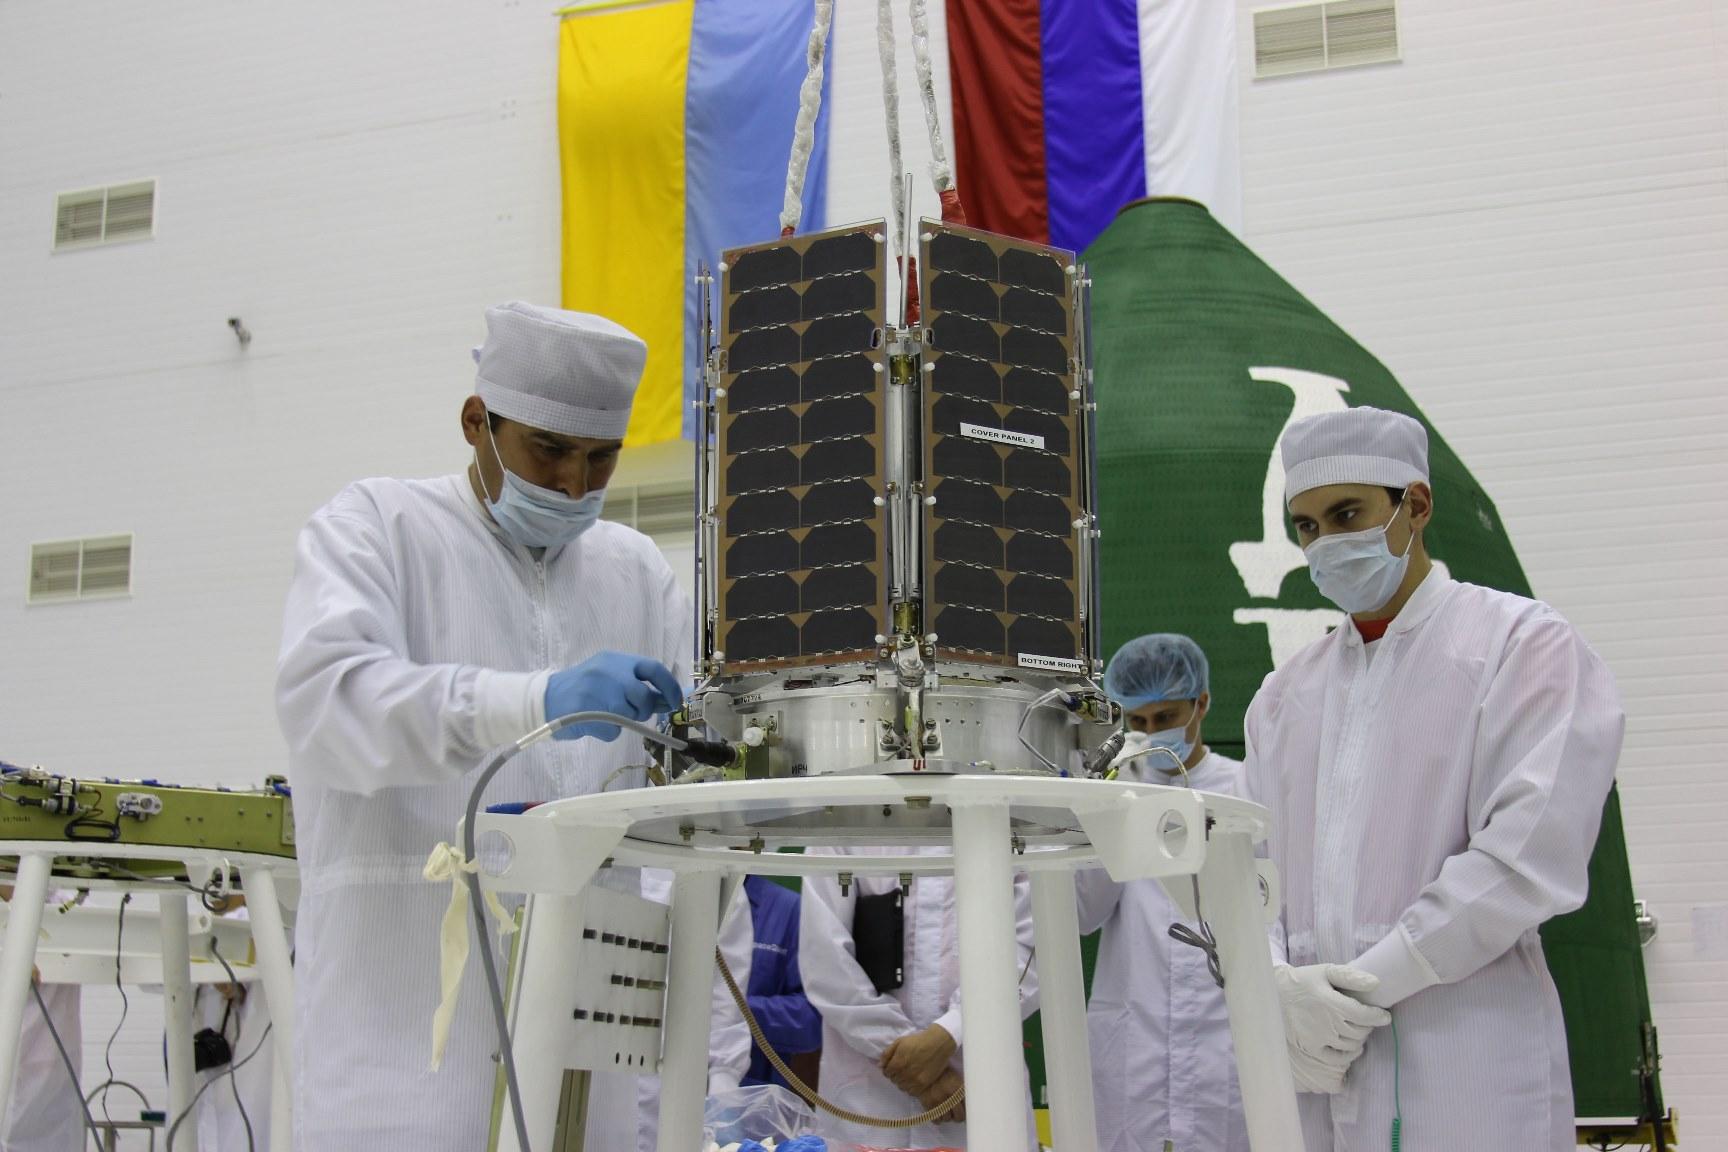 en37-pioneers-of-private-astronautics-in-russia-sputnix_06